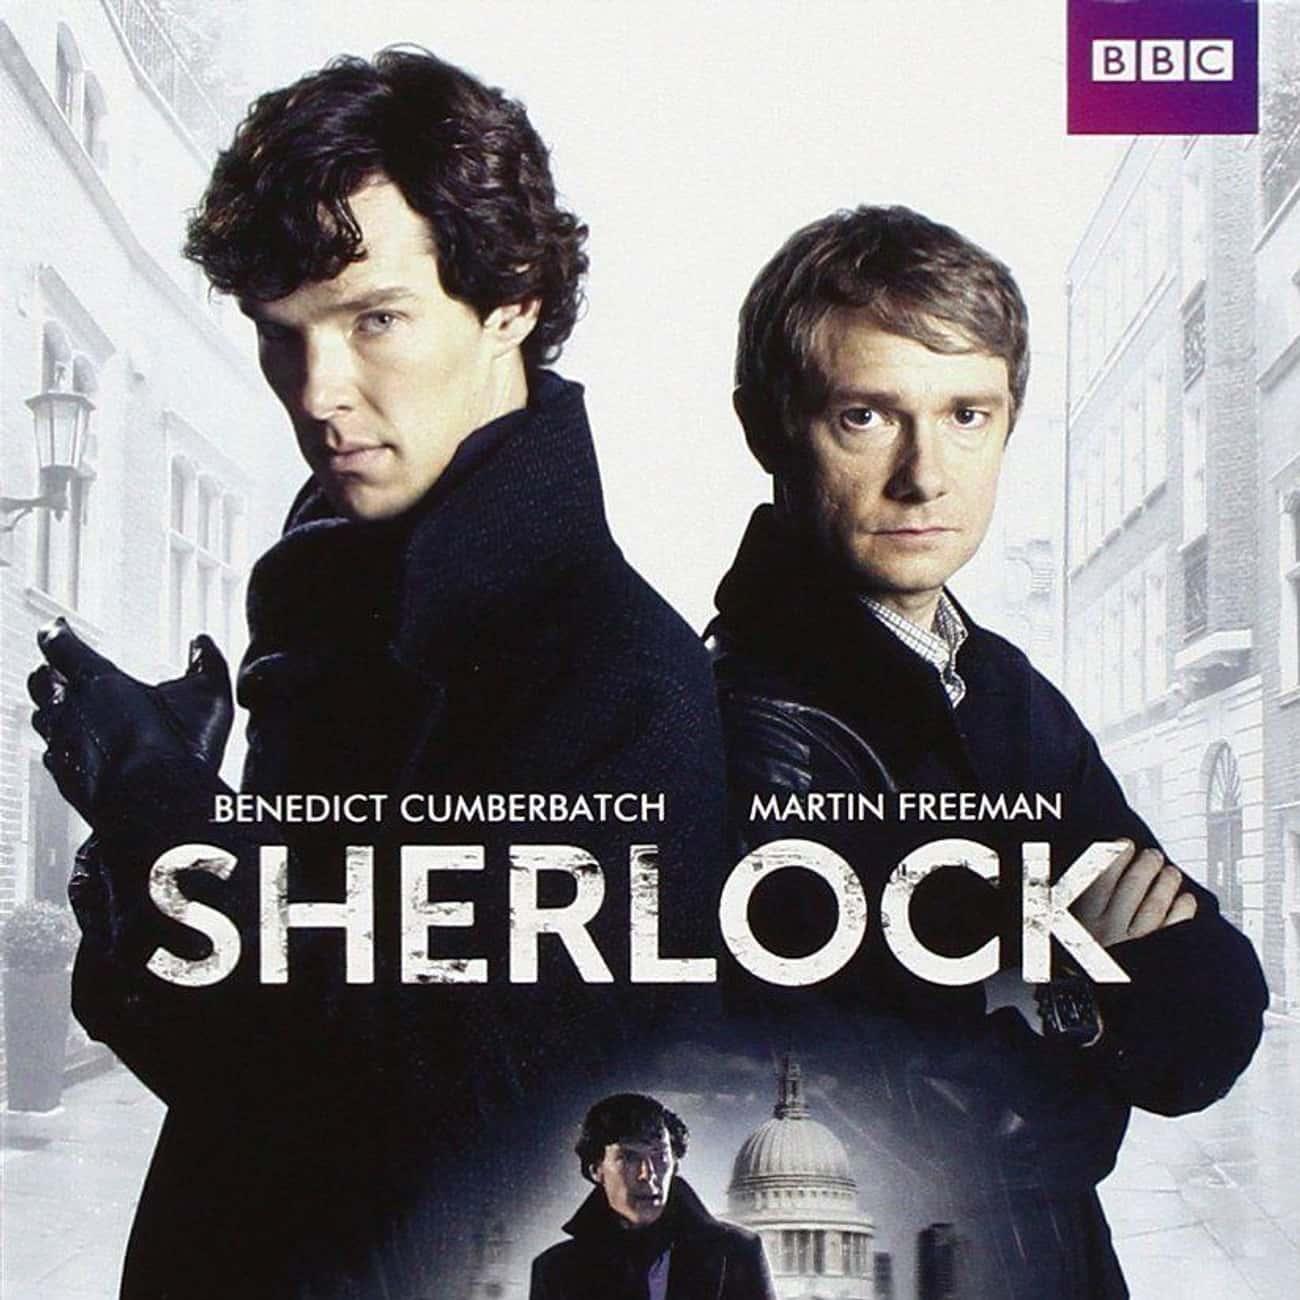 Sherlock - Season 3 is listed (or ranked) 3 on the list Ranking the Best Seasons of 'Sherlock'